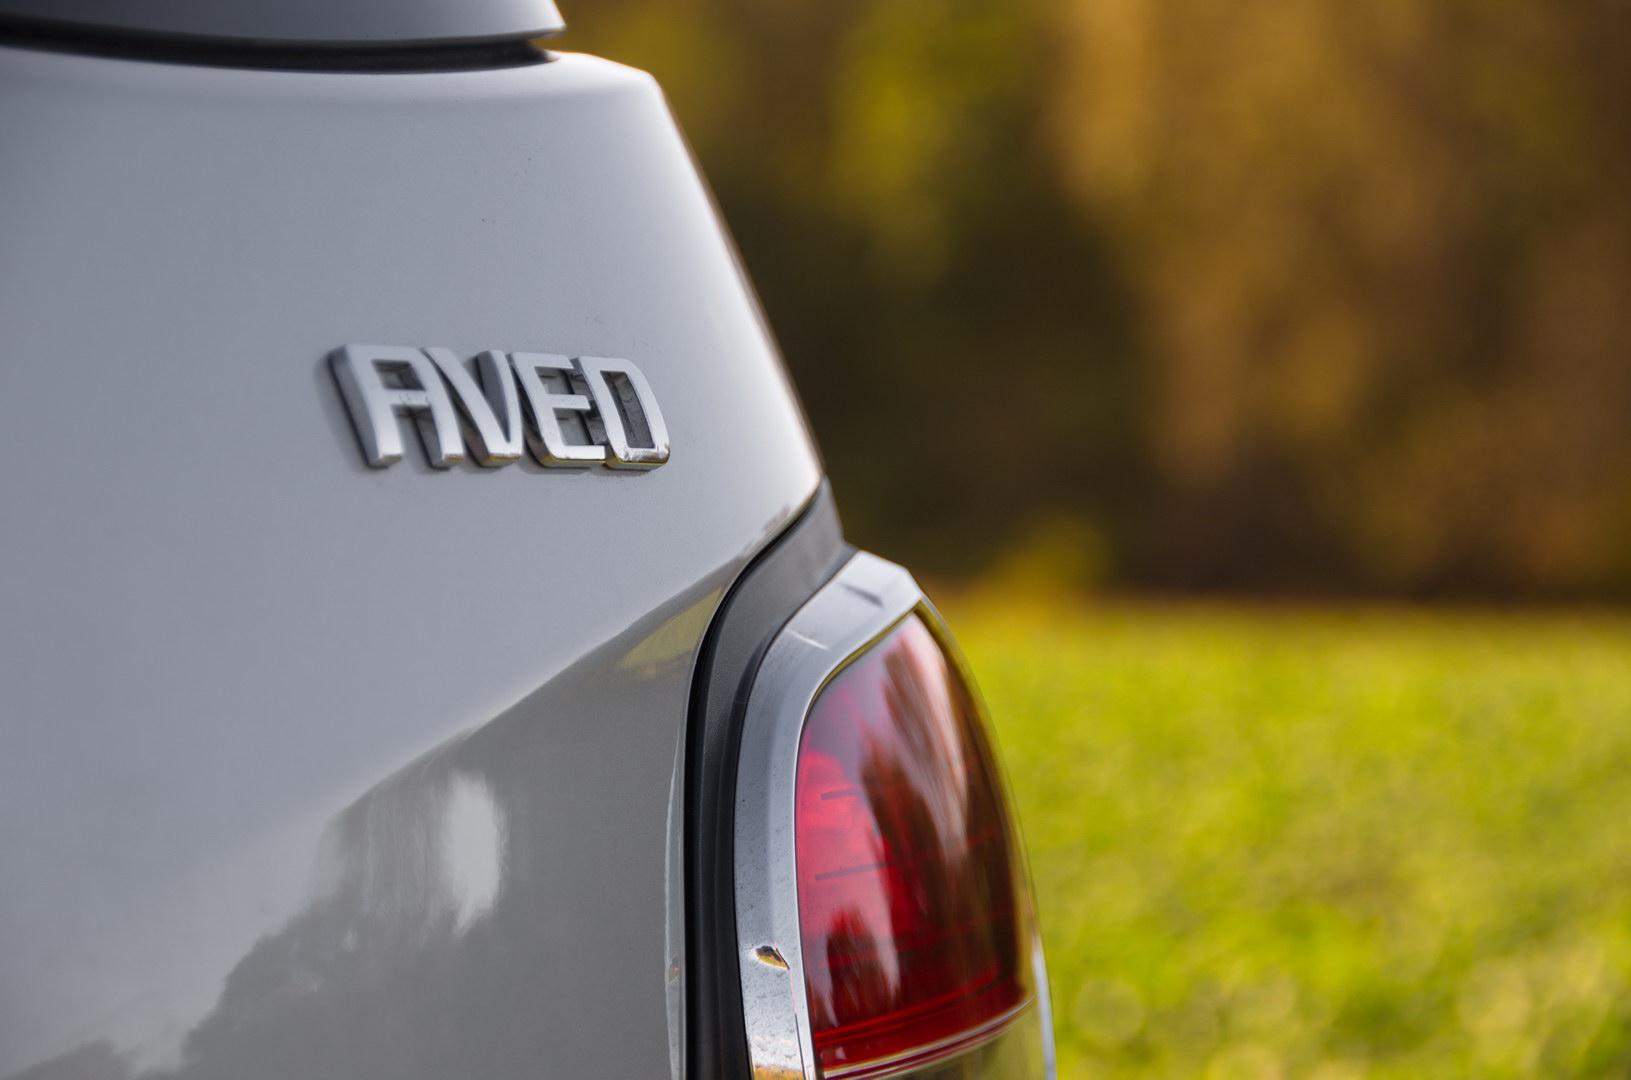 Chevrolet Aveo Heckleuchte Schriftzug